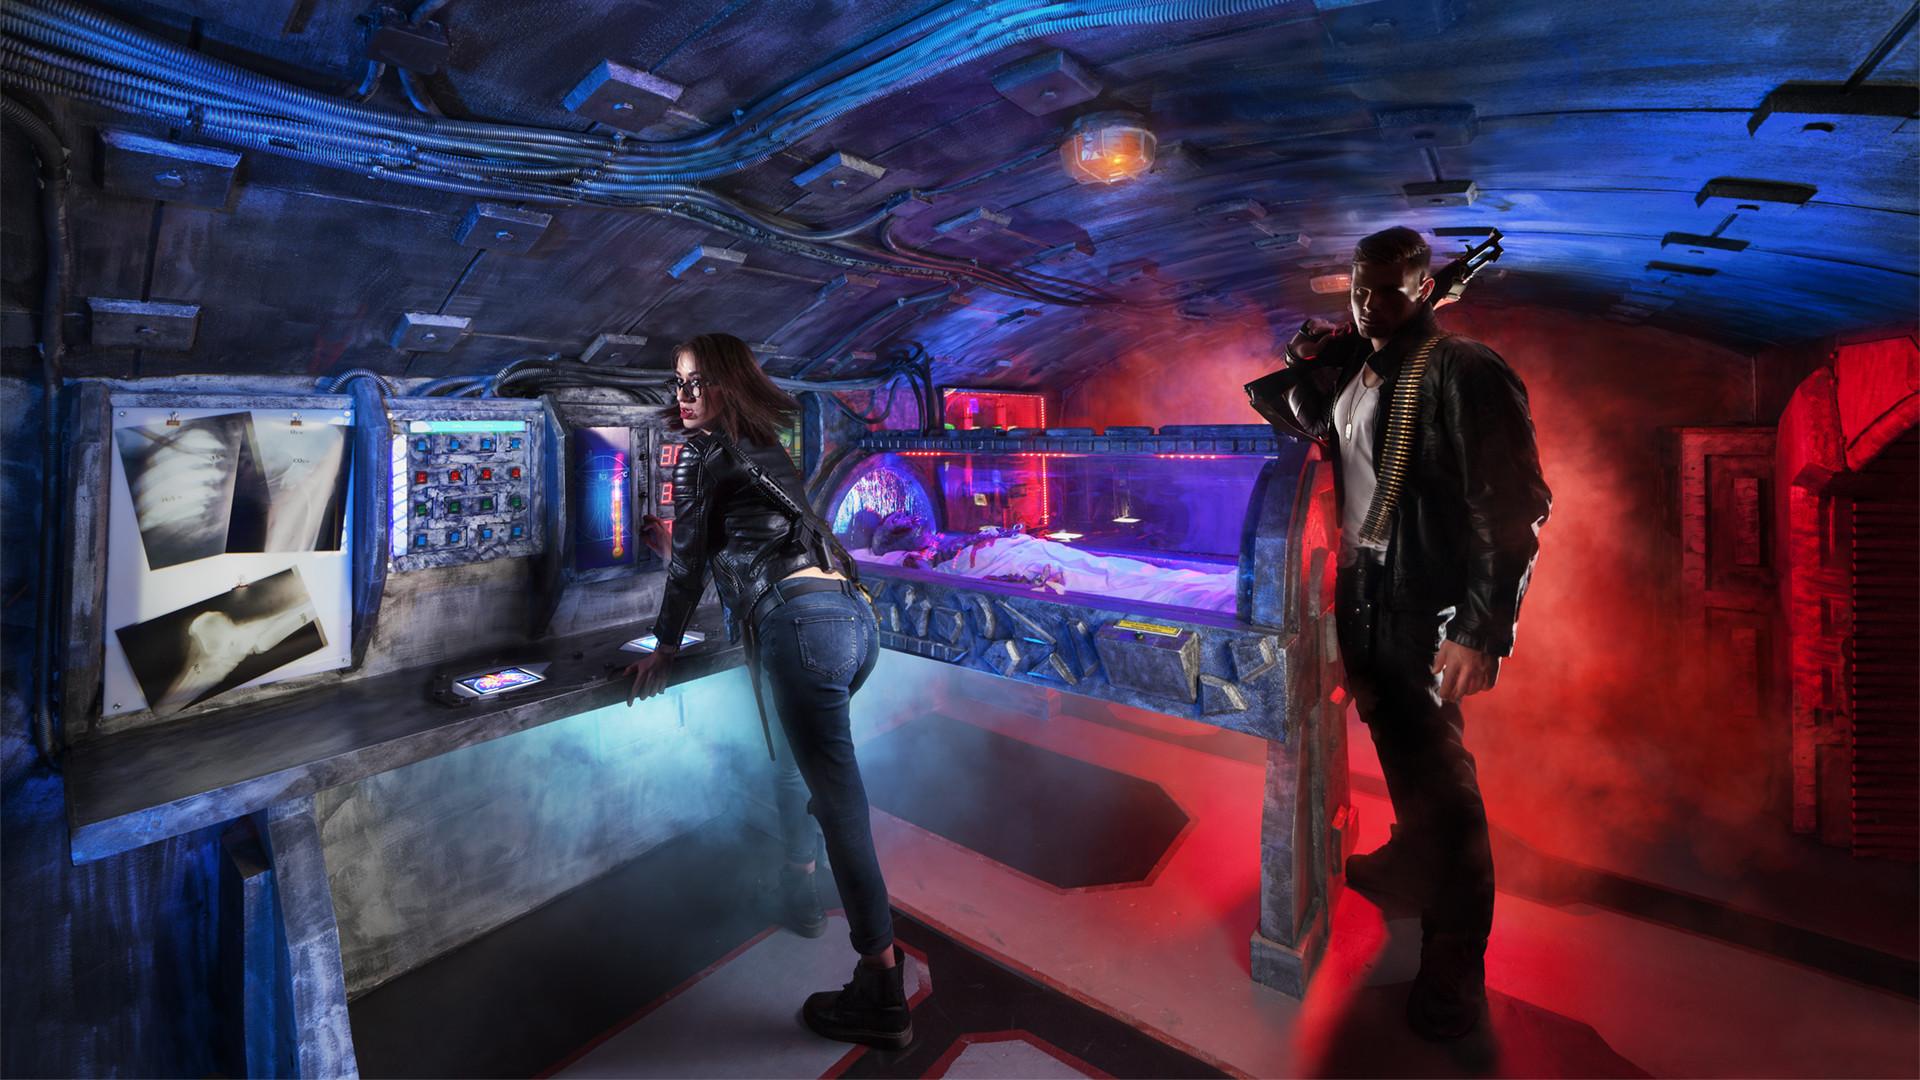 Apocalypse Zombie 2213 Escape Room In 420 774 458 073